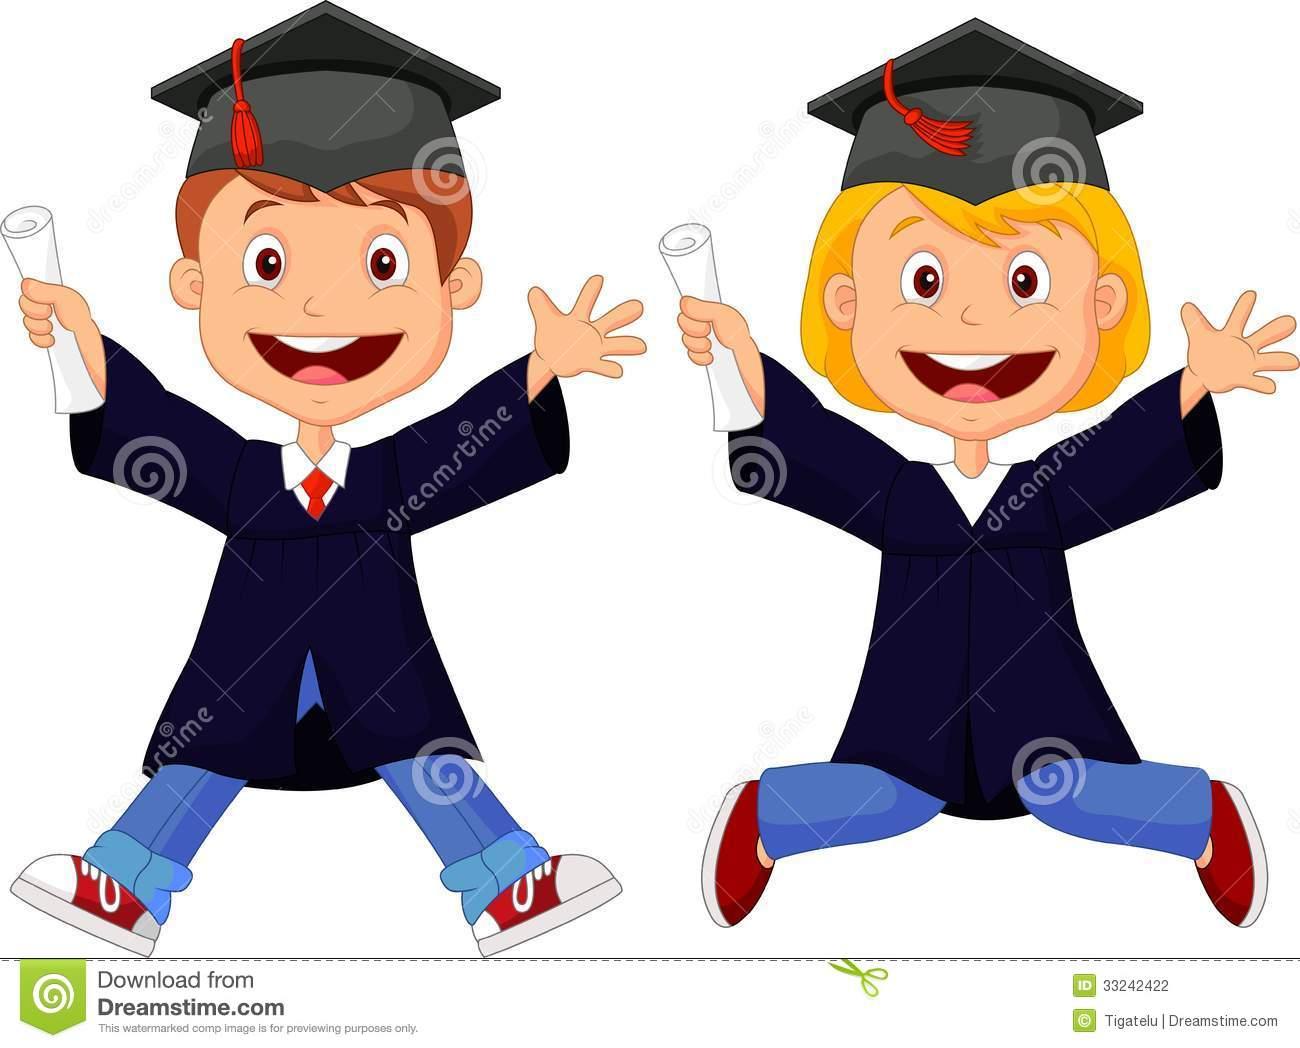 Graduation Cartoon Clipart - Clipart Kid